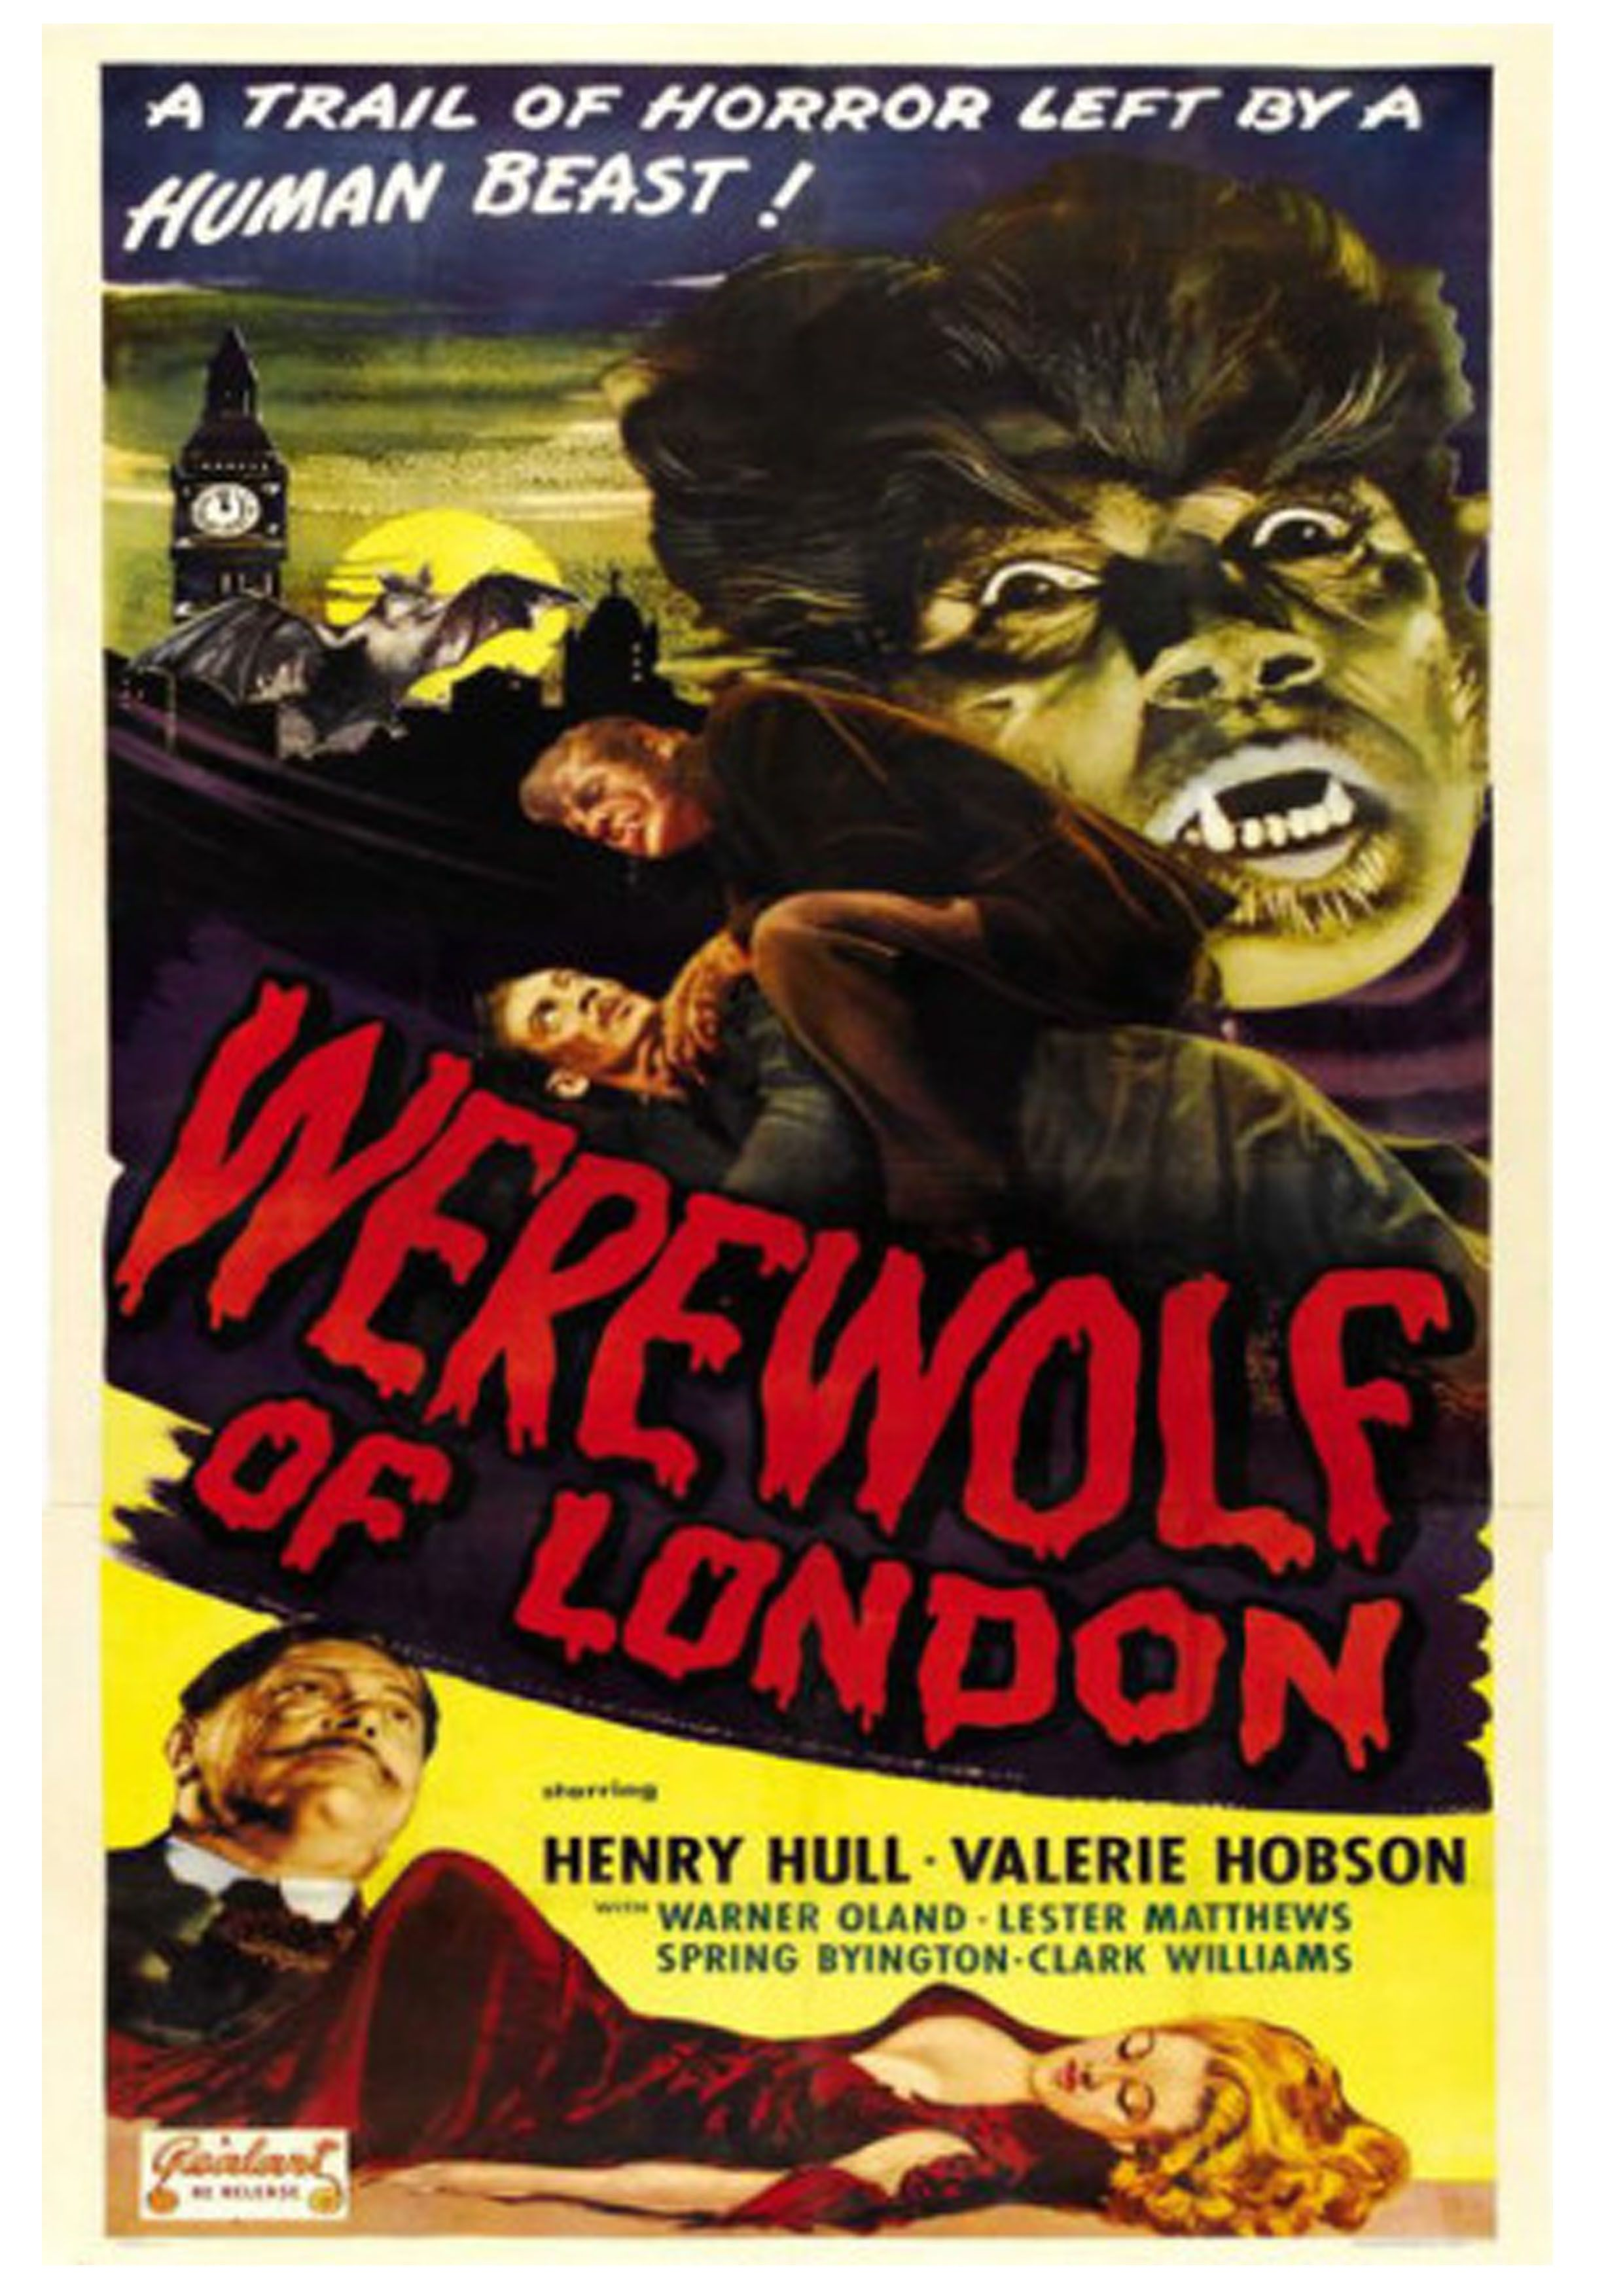 1935 horror poster classic posters pinterest horror